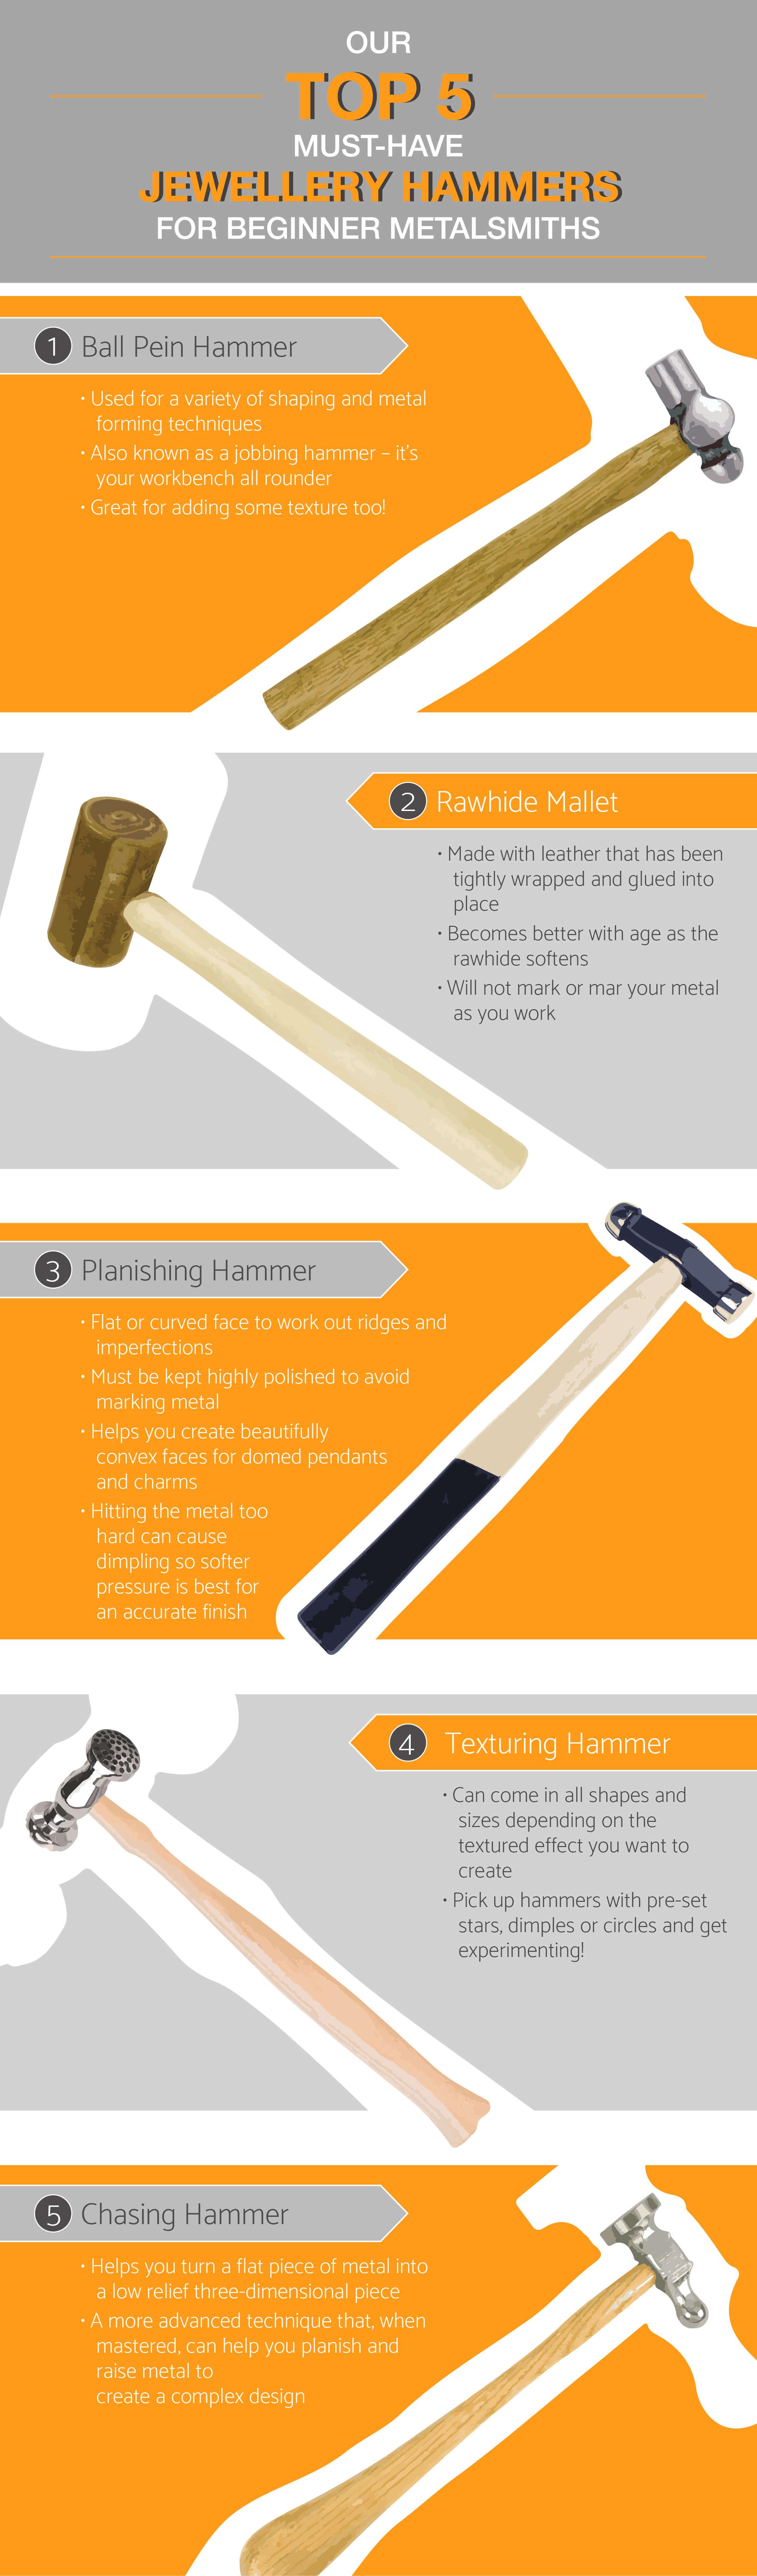 top 5 hammers